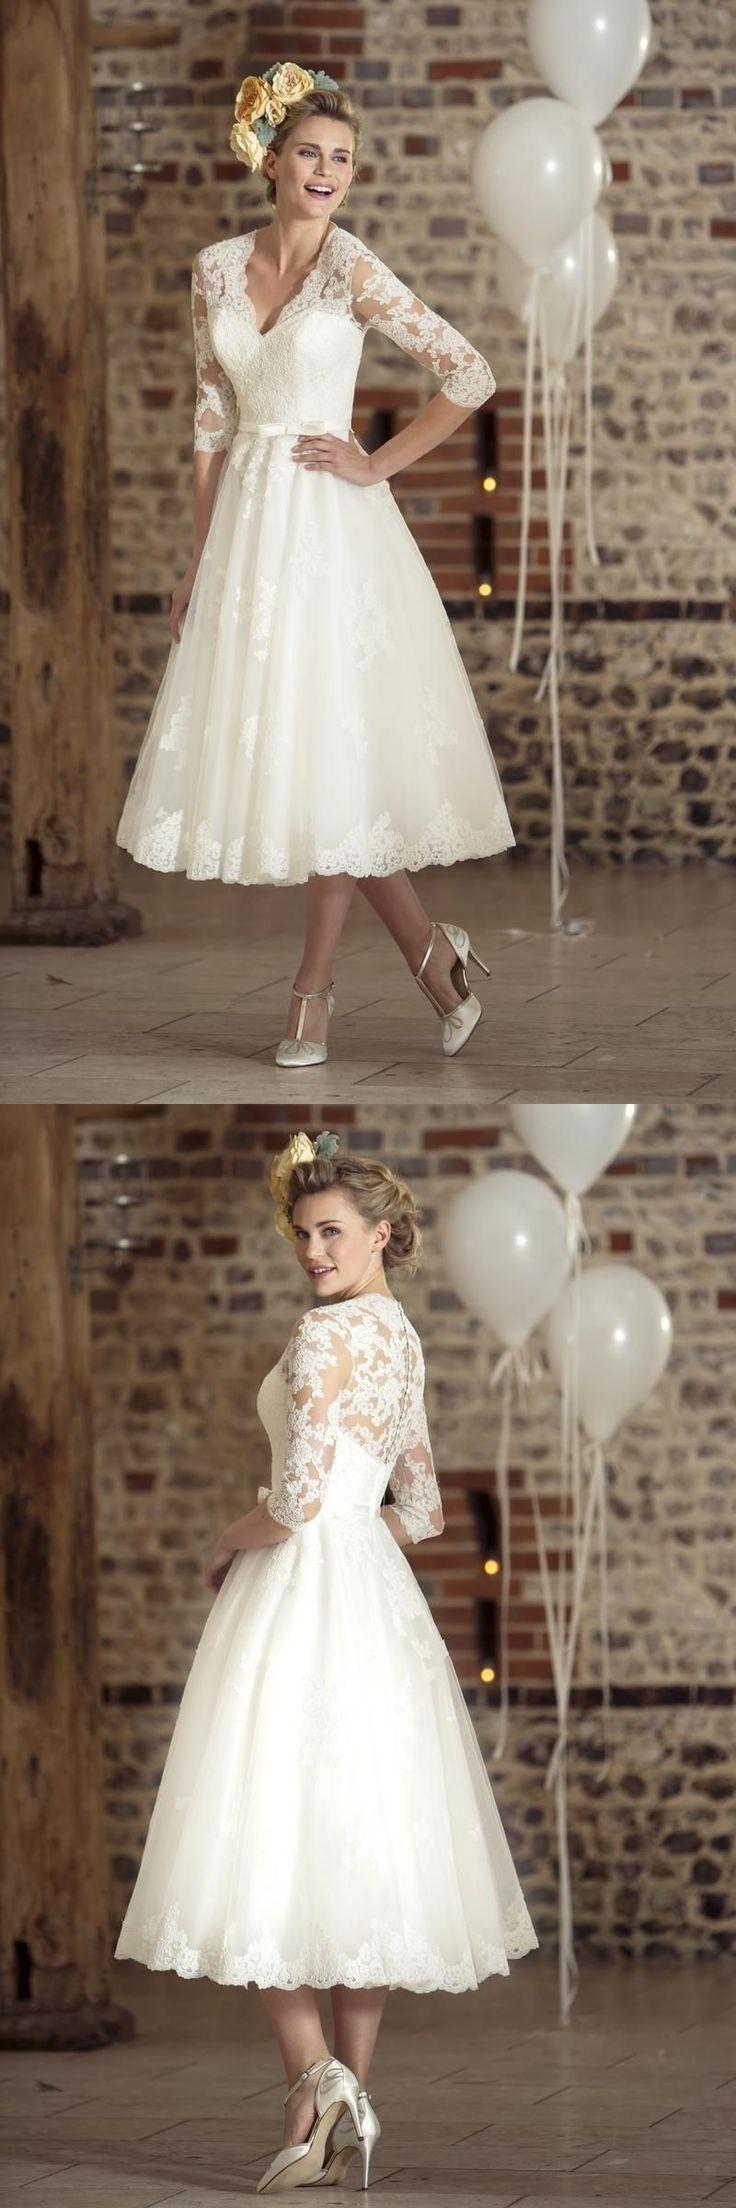 Best Tea Length Wedding Dresses Ideas On Pinterest Tea